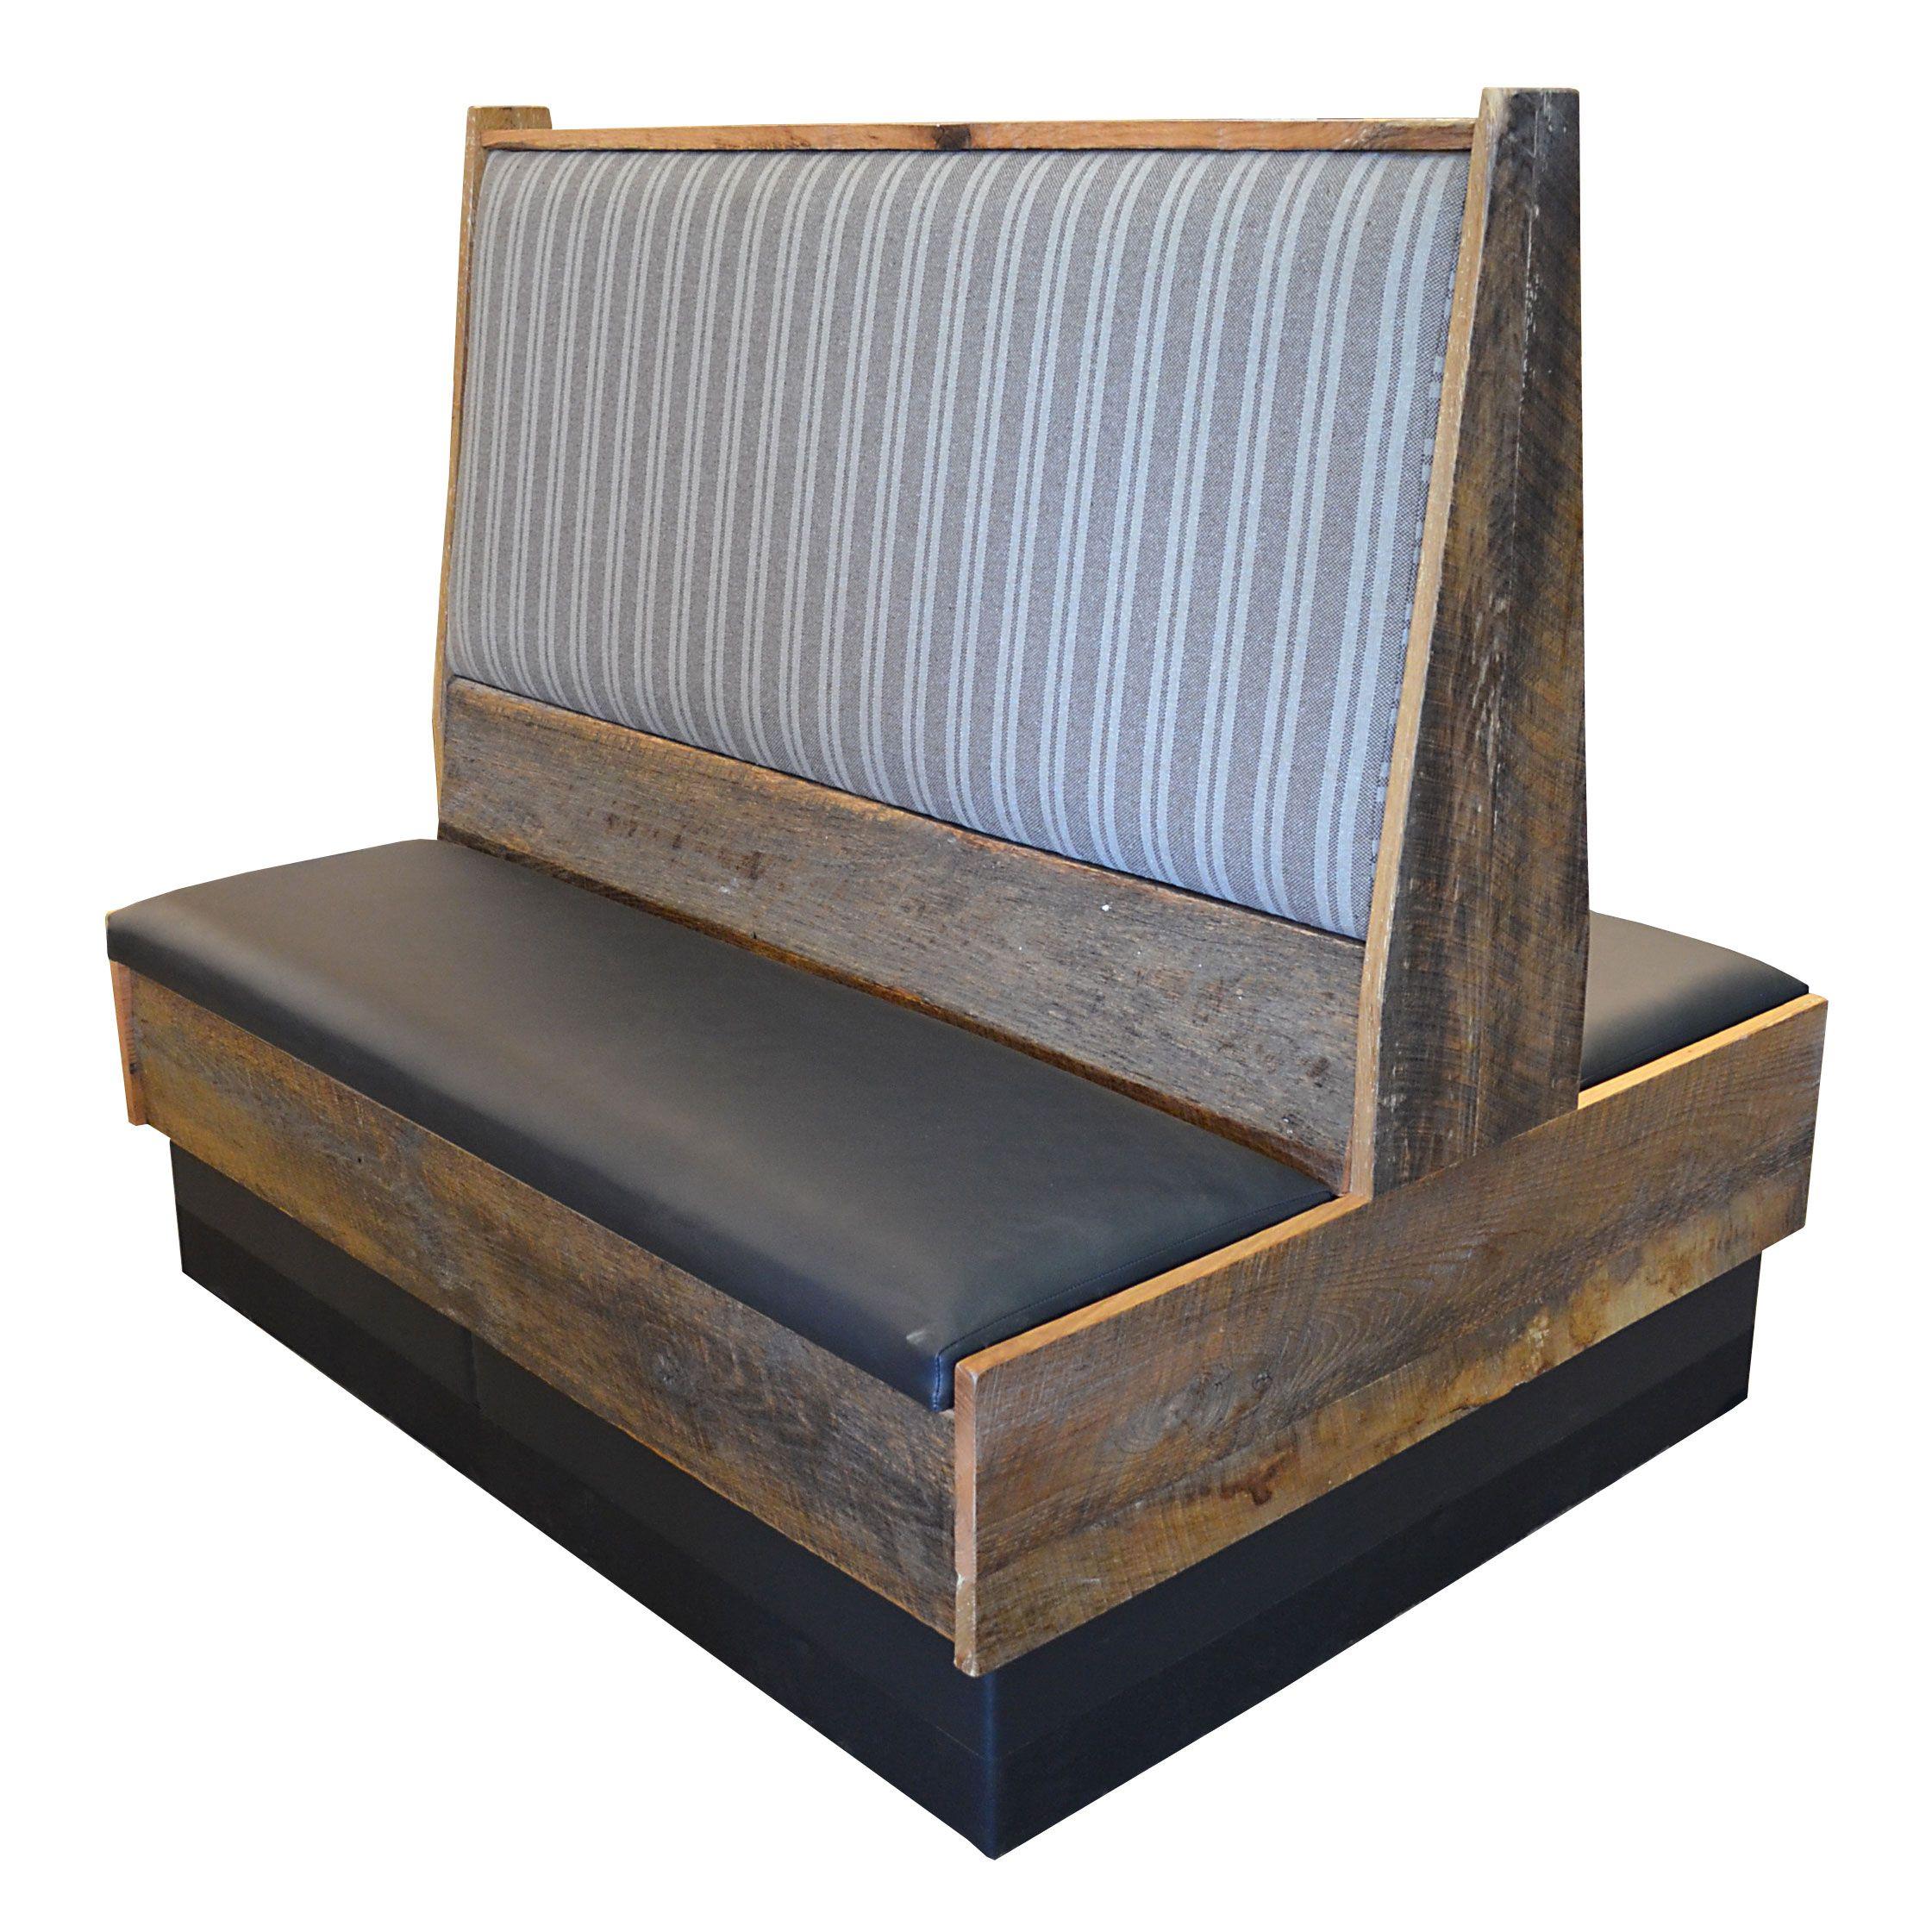 A Custom Made Reclaimed Wood Restaurant Booth